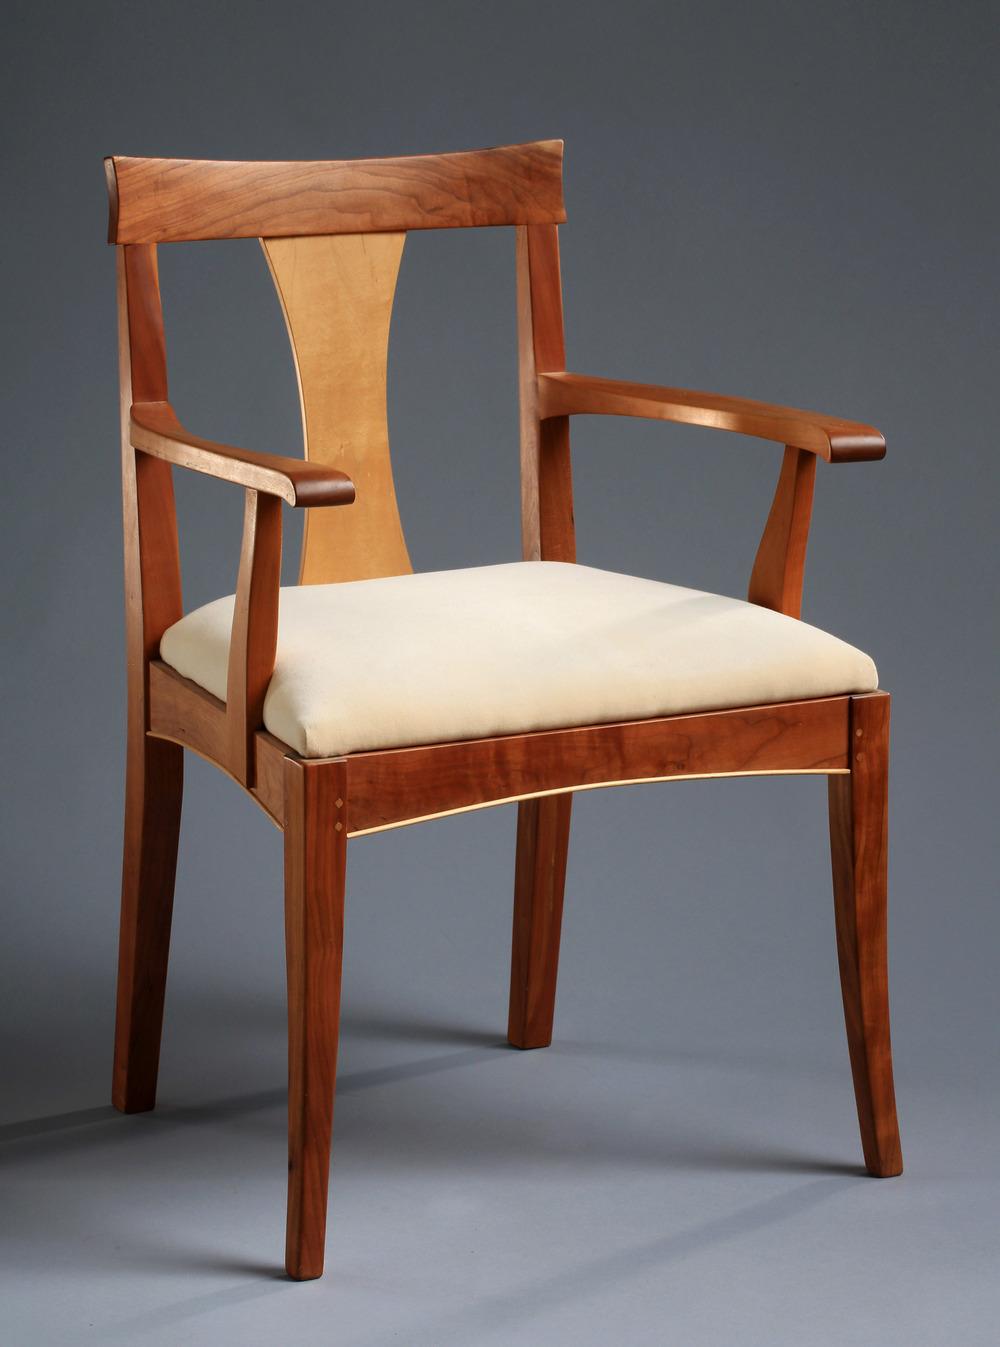 The Westport Arm Chair